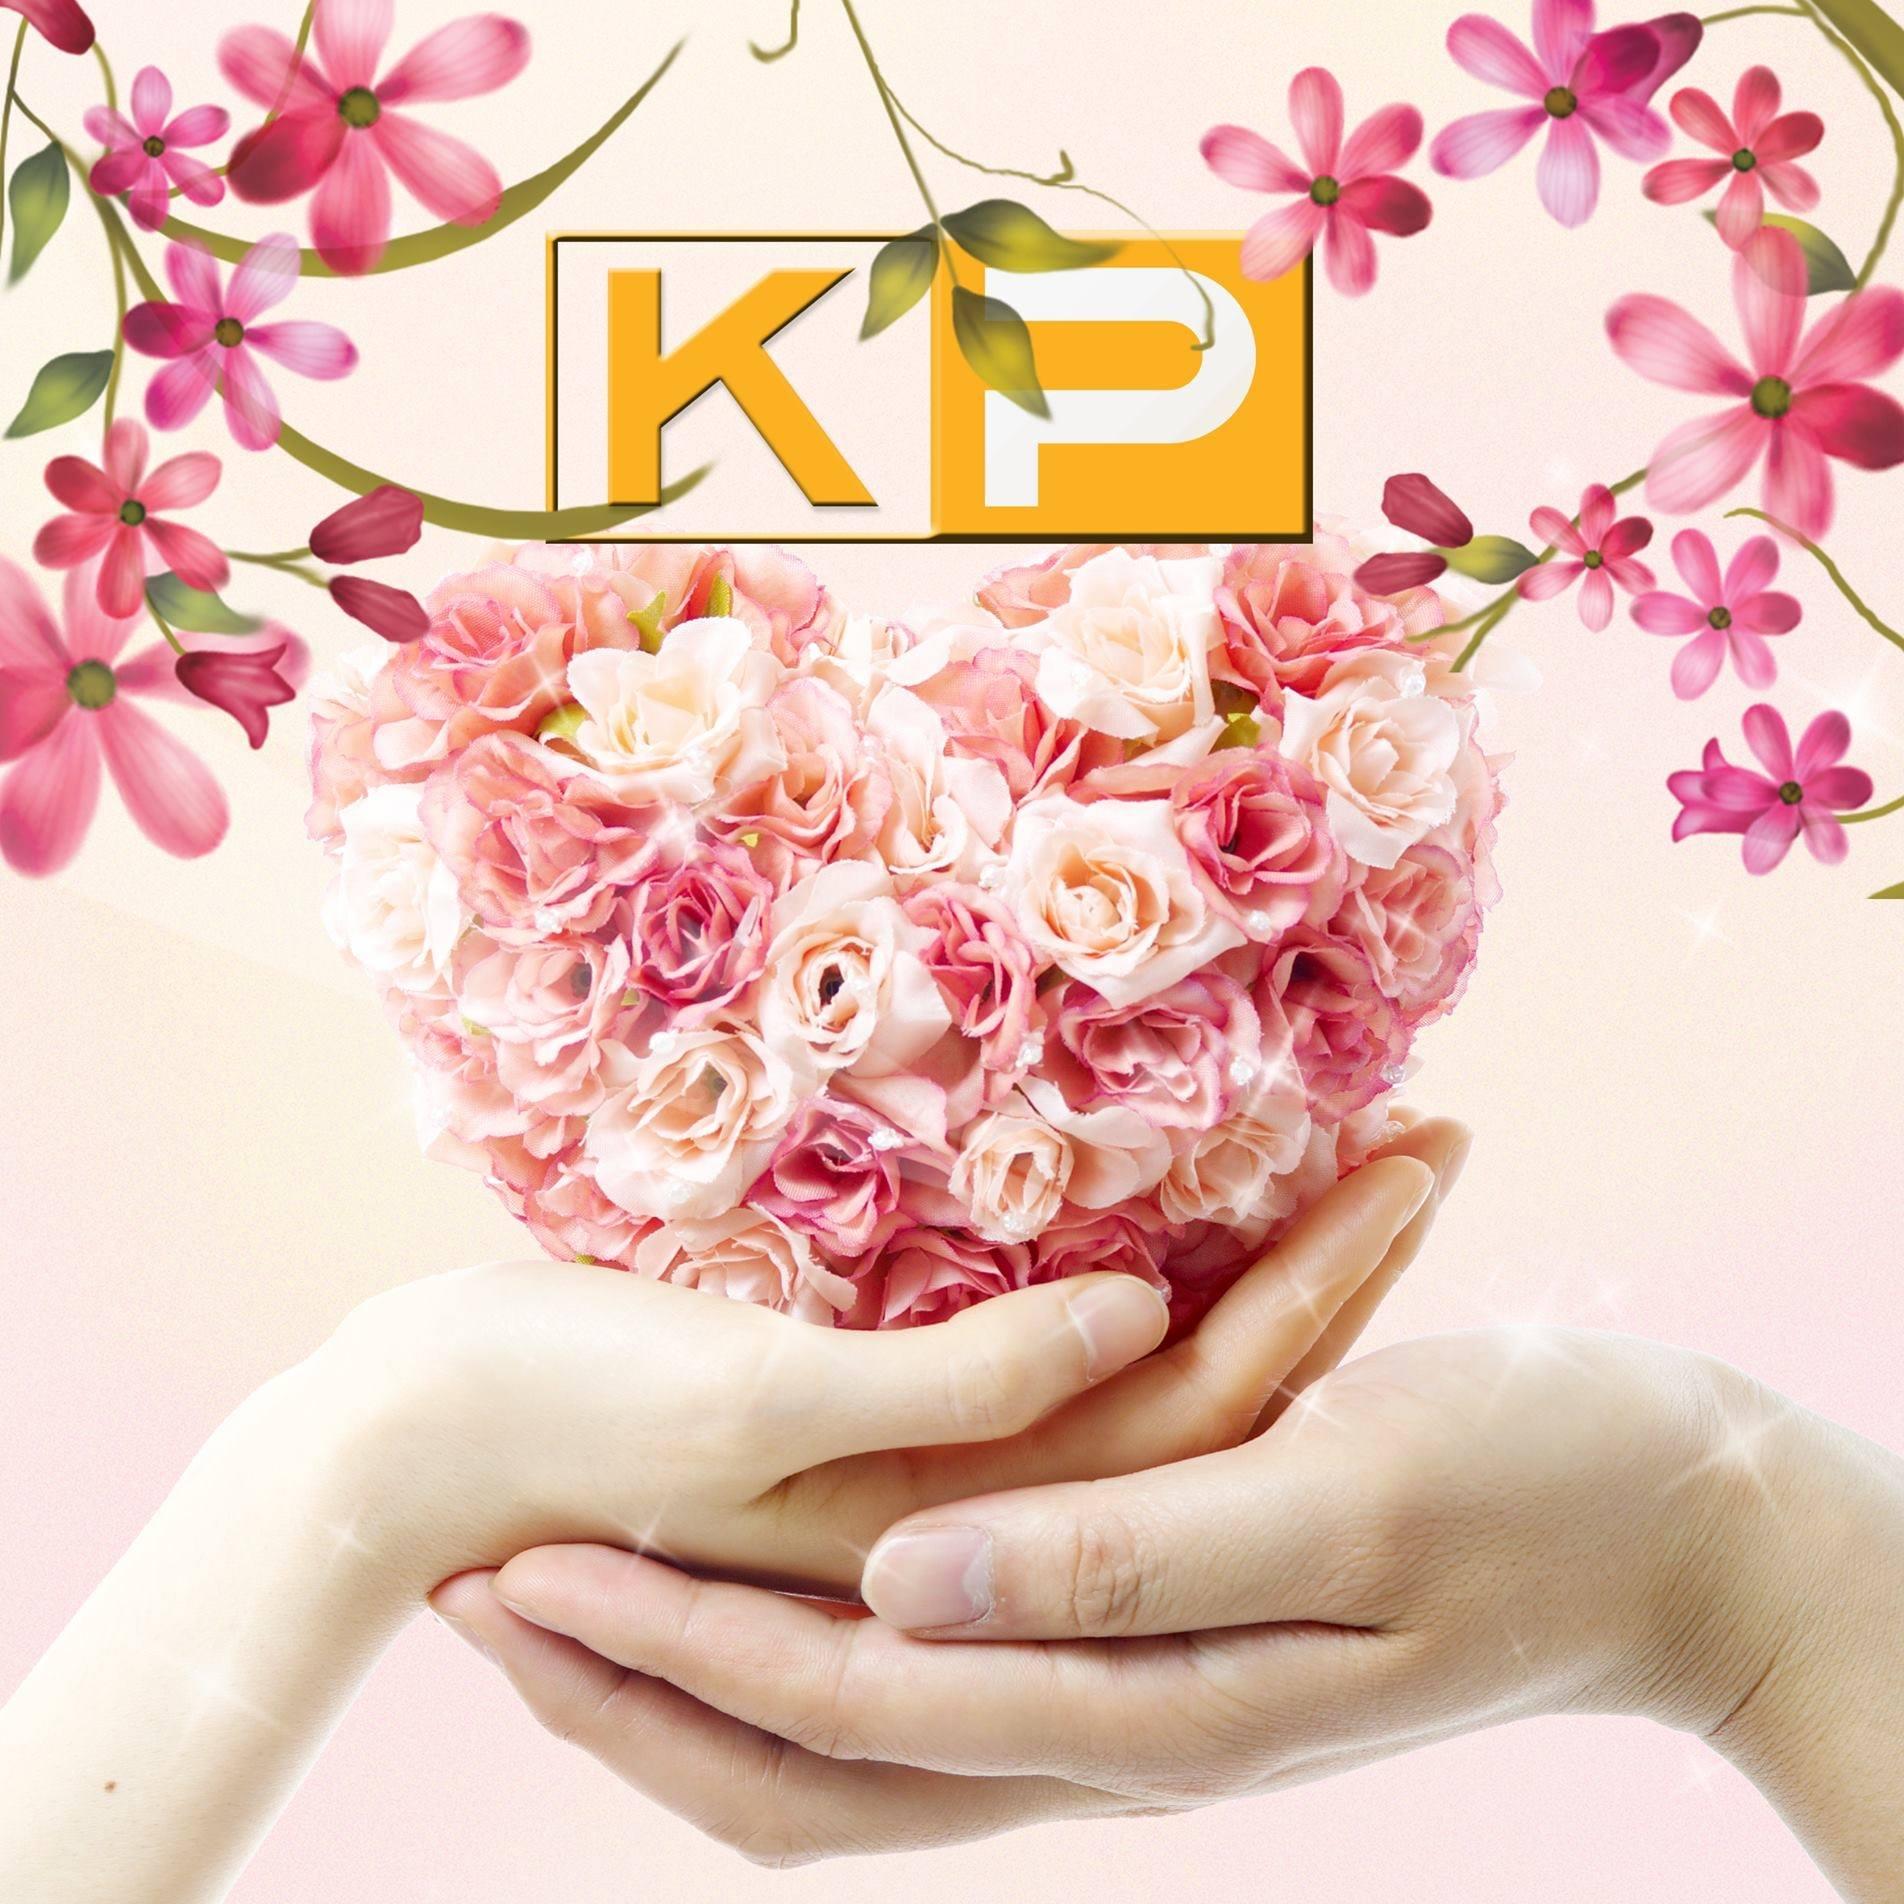 KHOIPHAM Studio